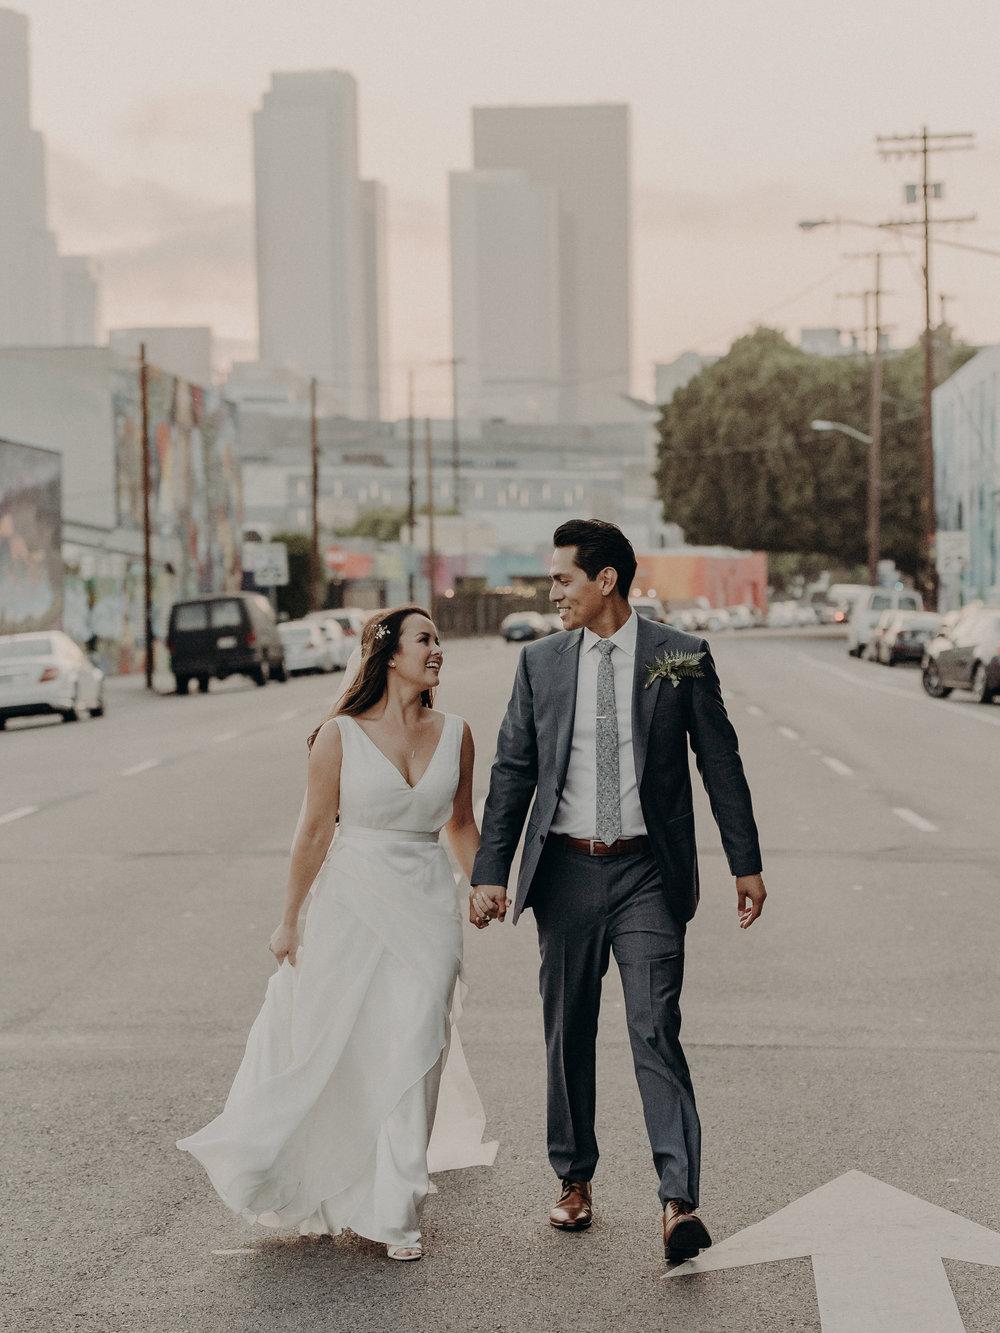 IsaiahAndTaylor.com - DTLA Millwick Wedding -109.jpg